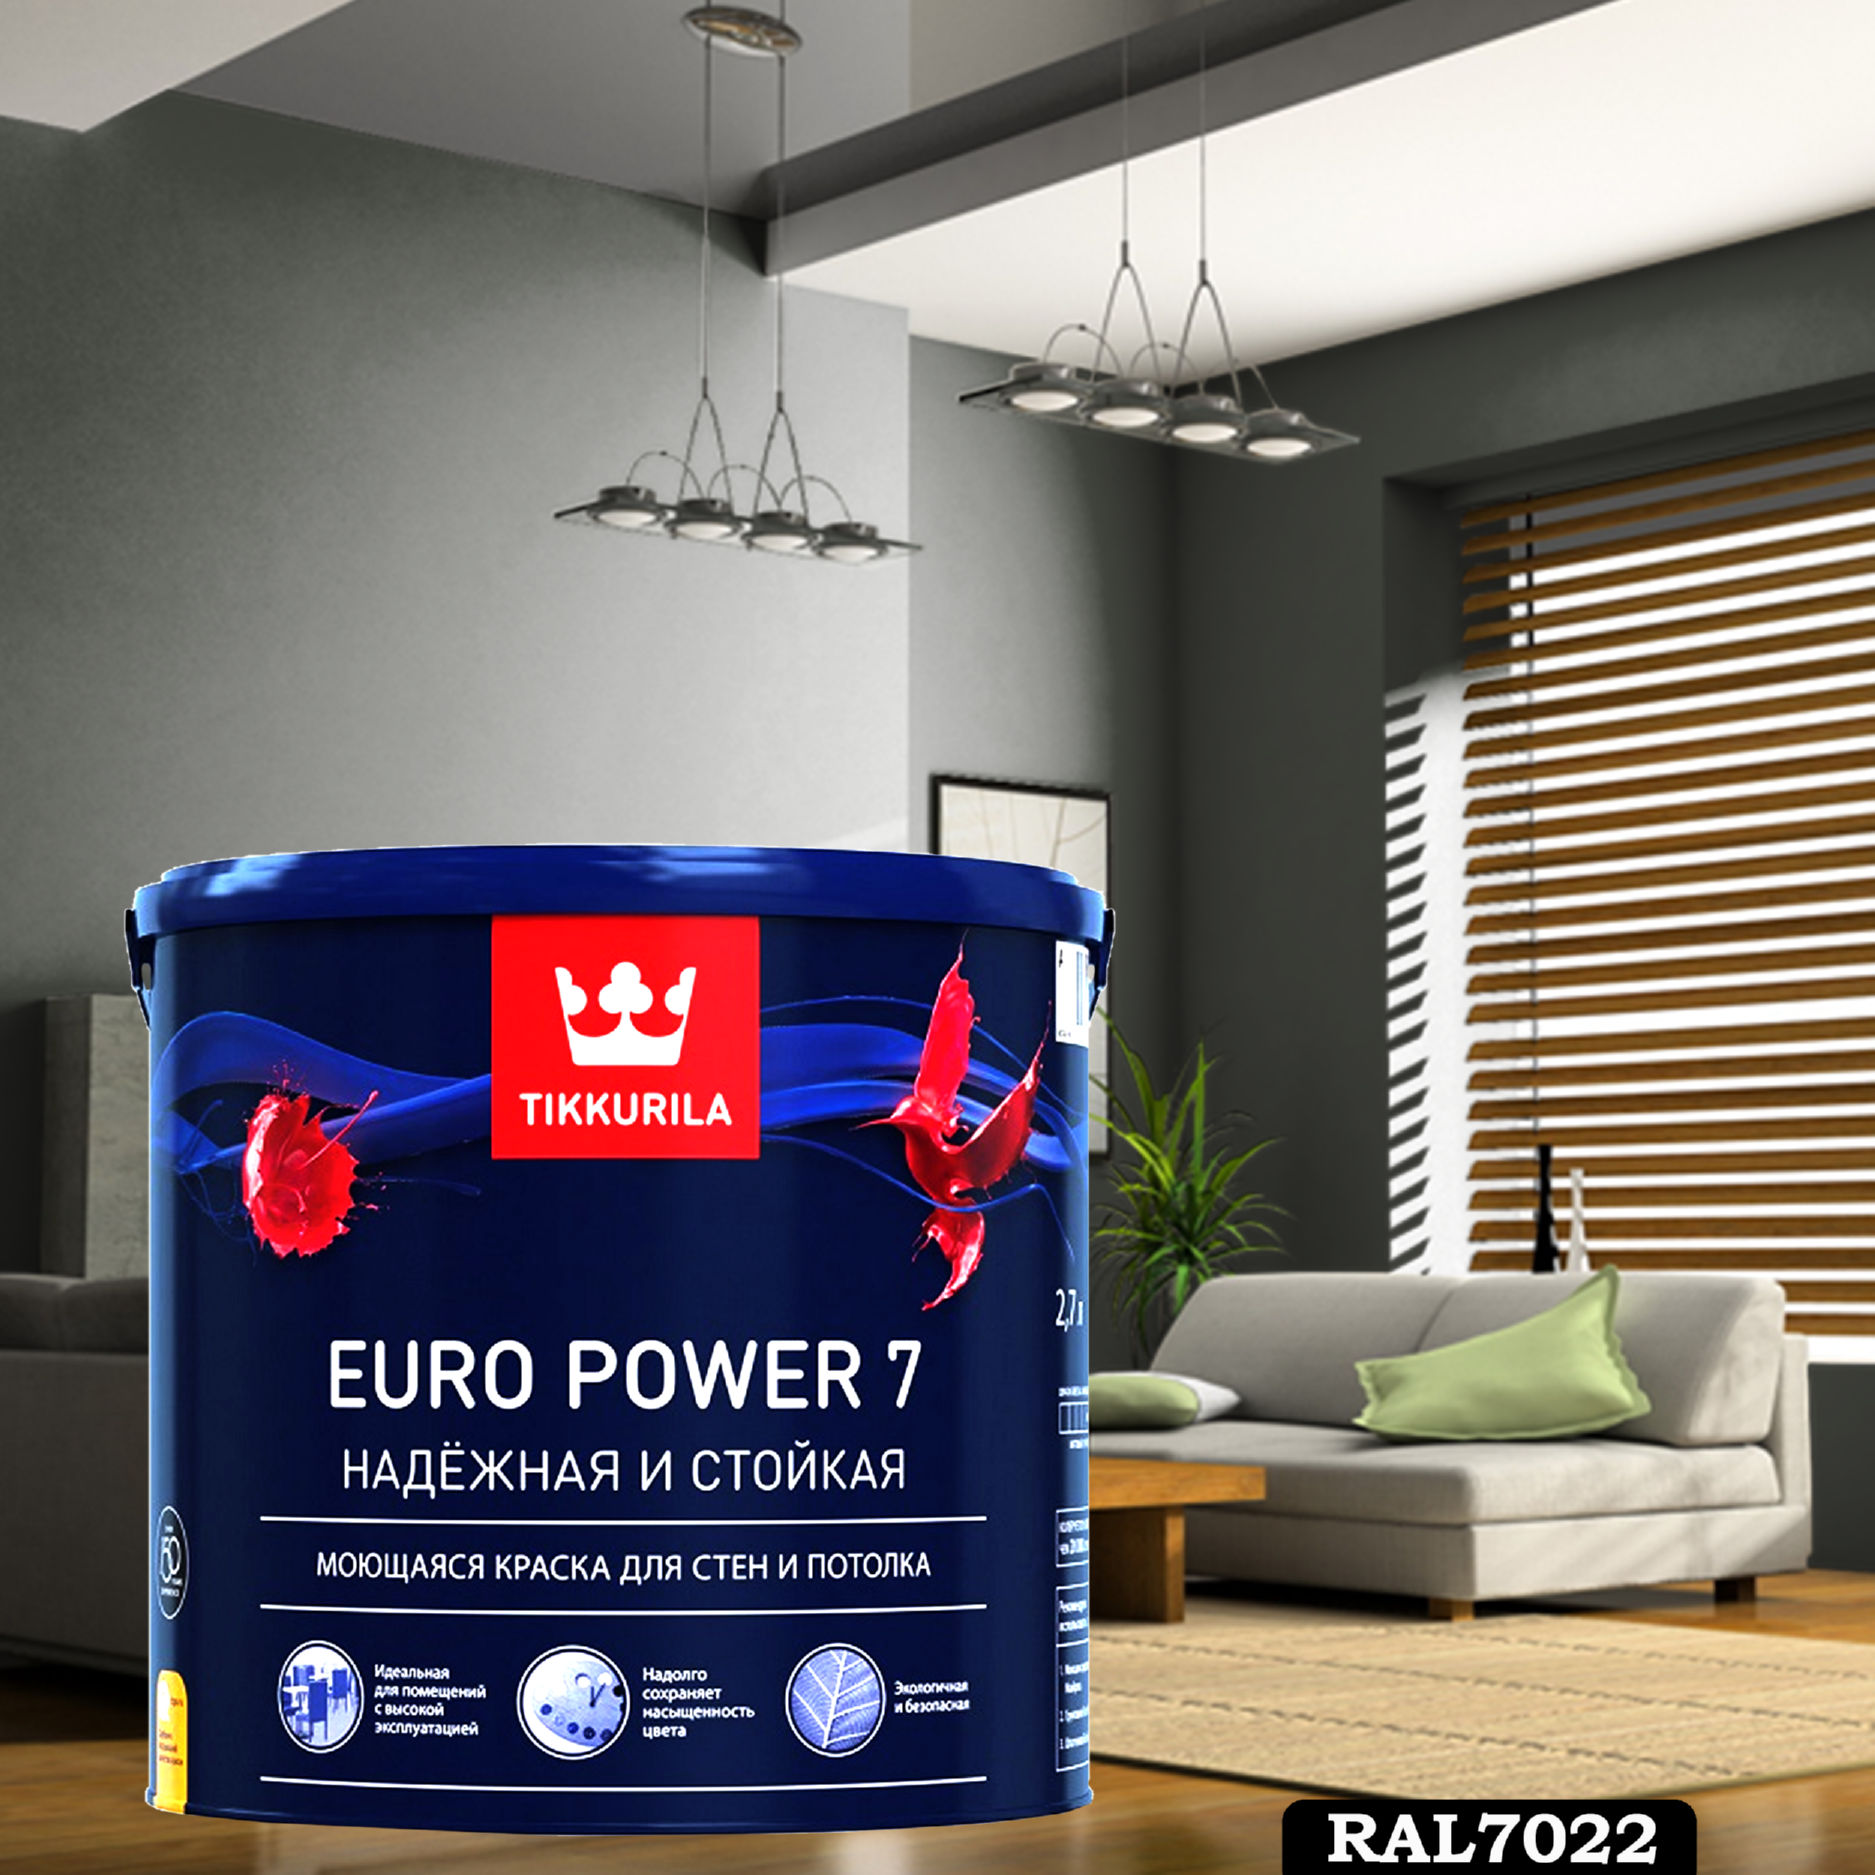 Фото 17 - Краска TIKKURILA Euro Power 7,  RAL 7022 Умбра-серая, латексная моющаяся матовая интерьерная, 9 л.